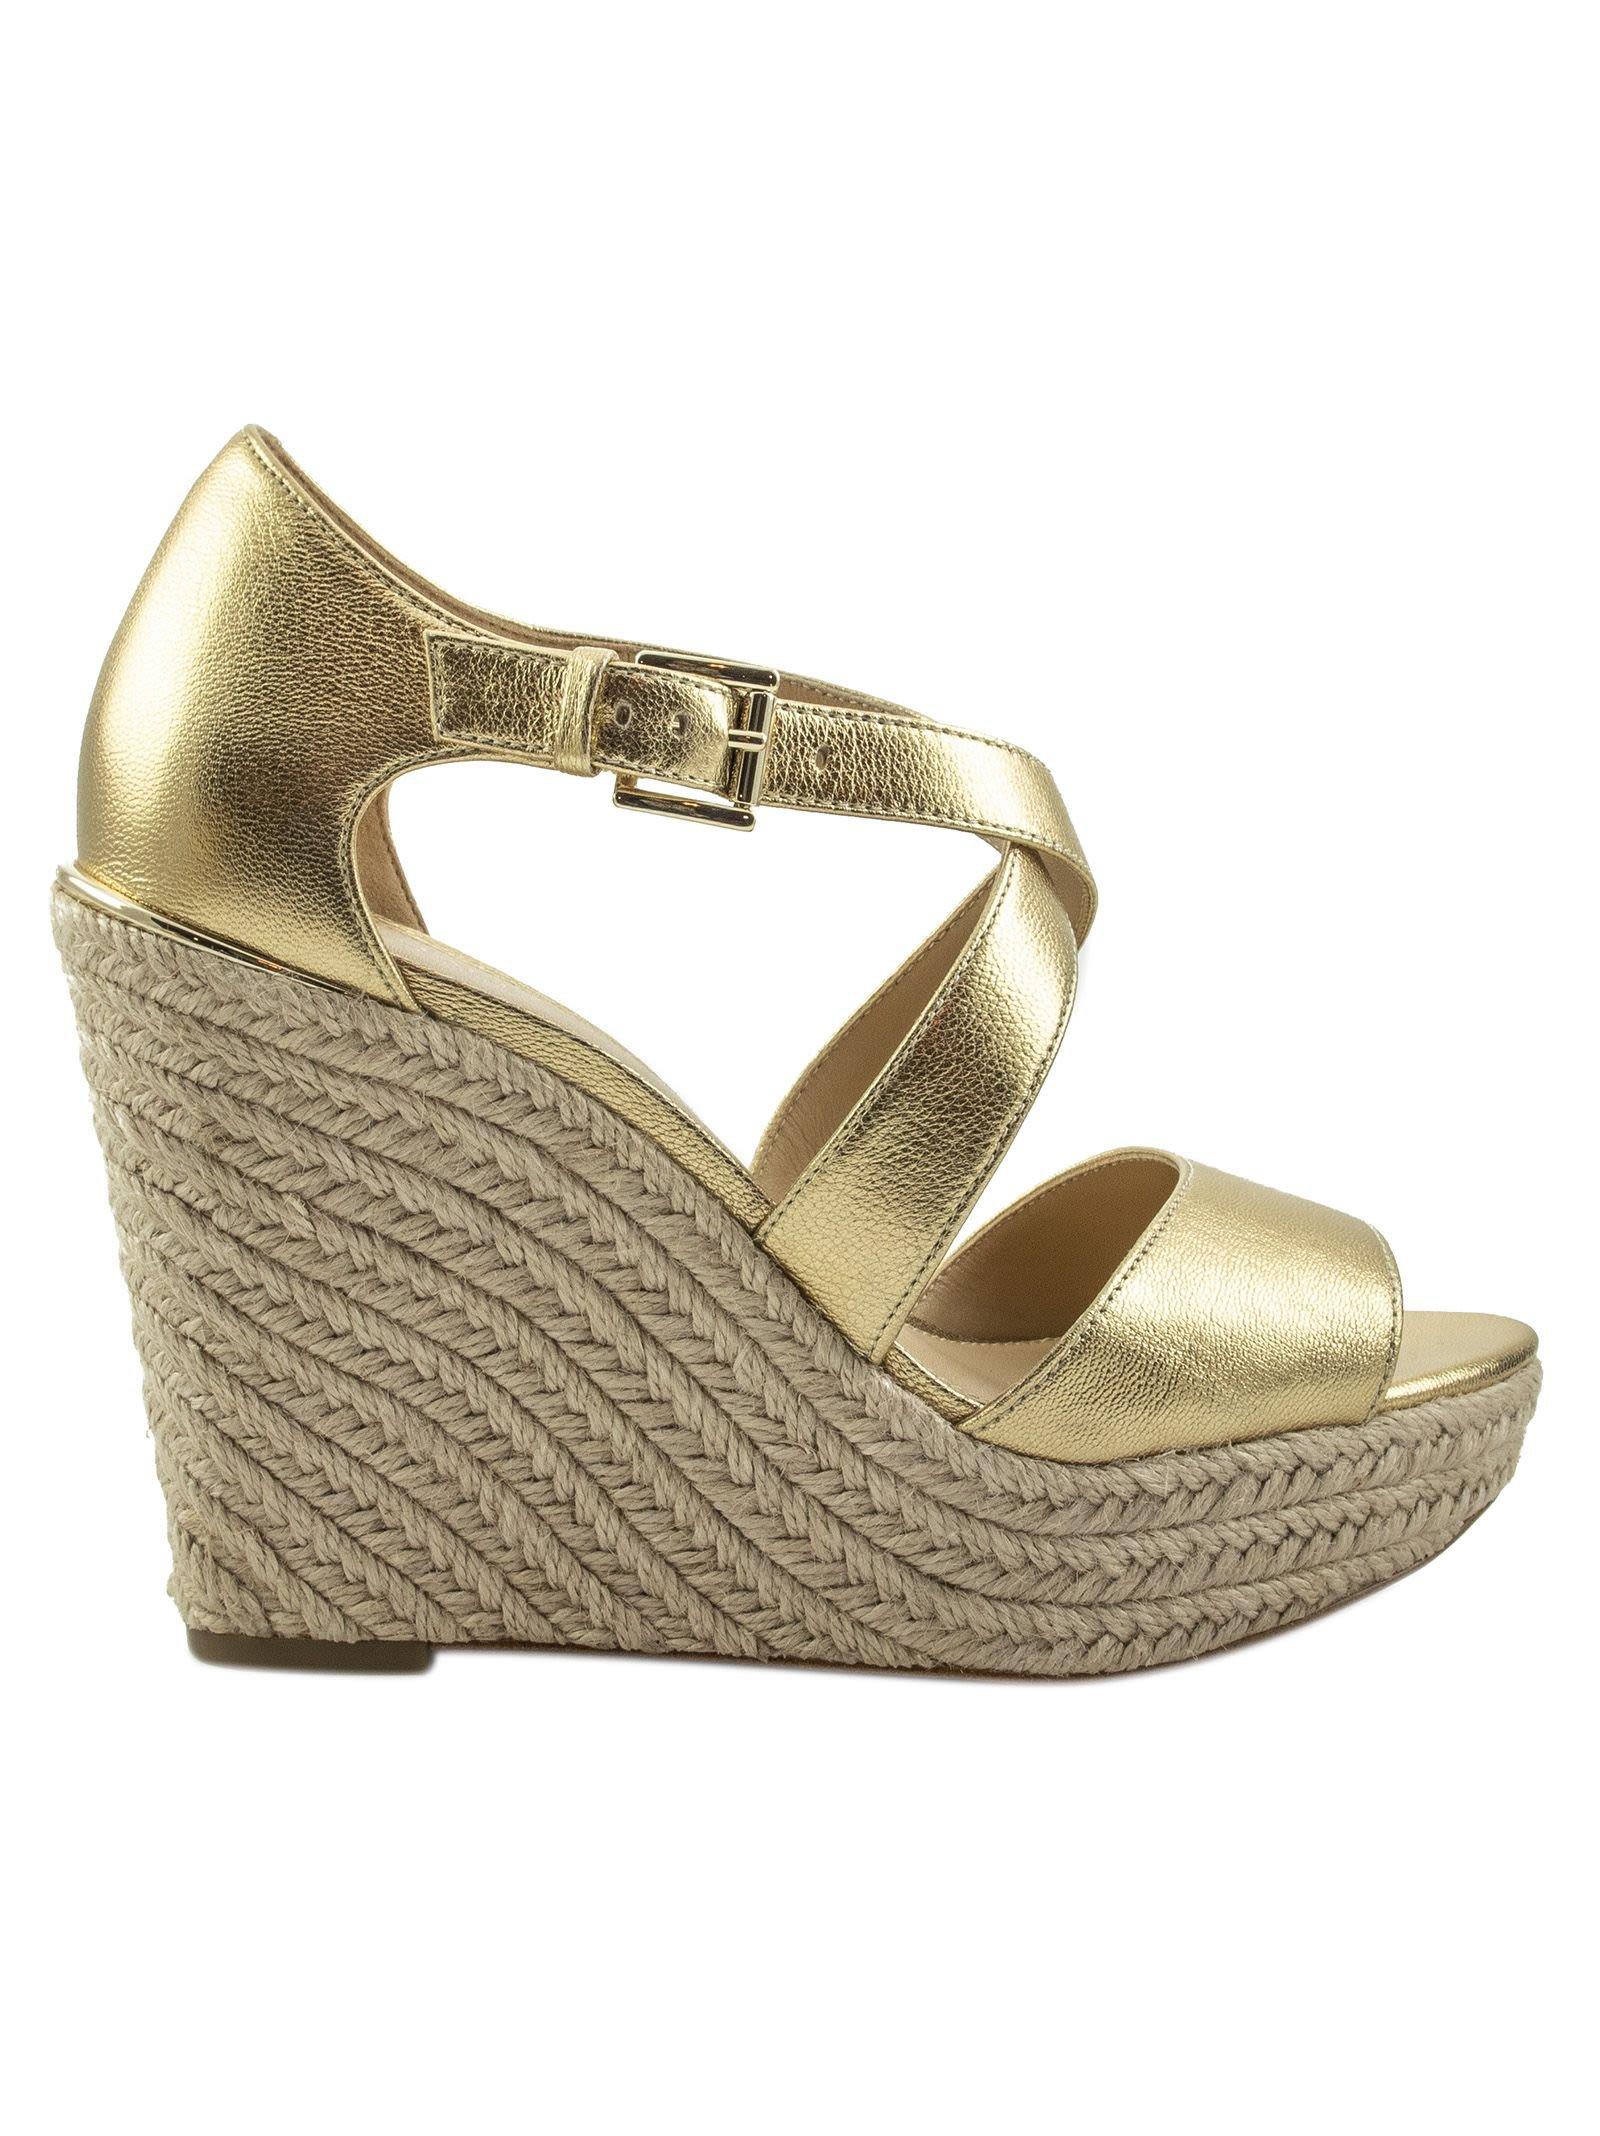 Michael Kors Braided Sandals